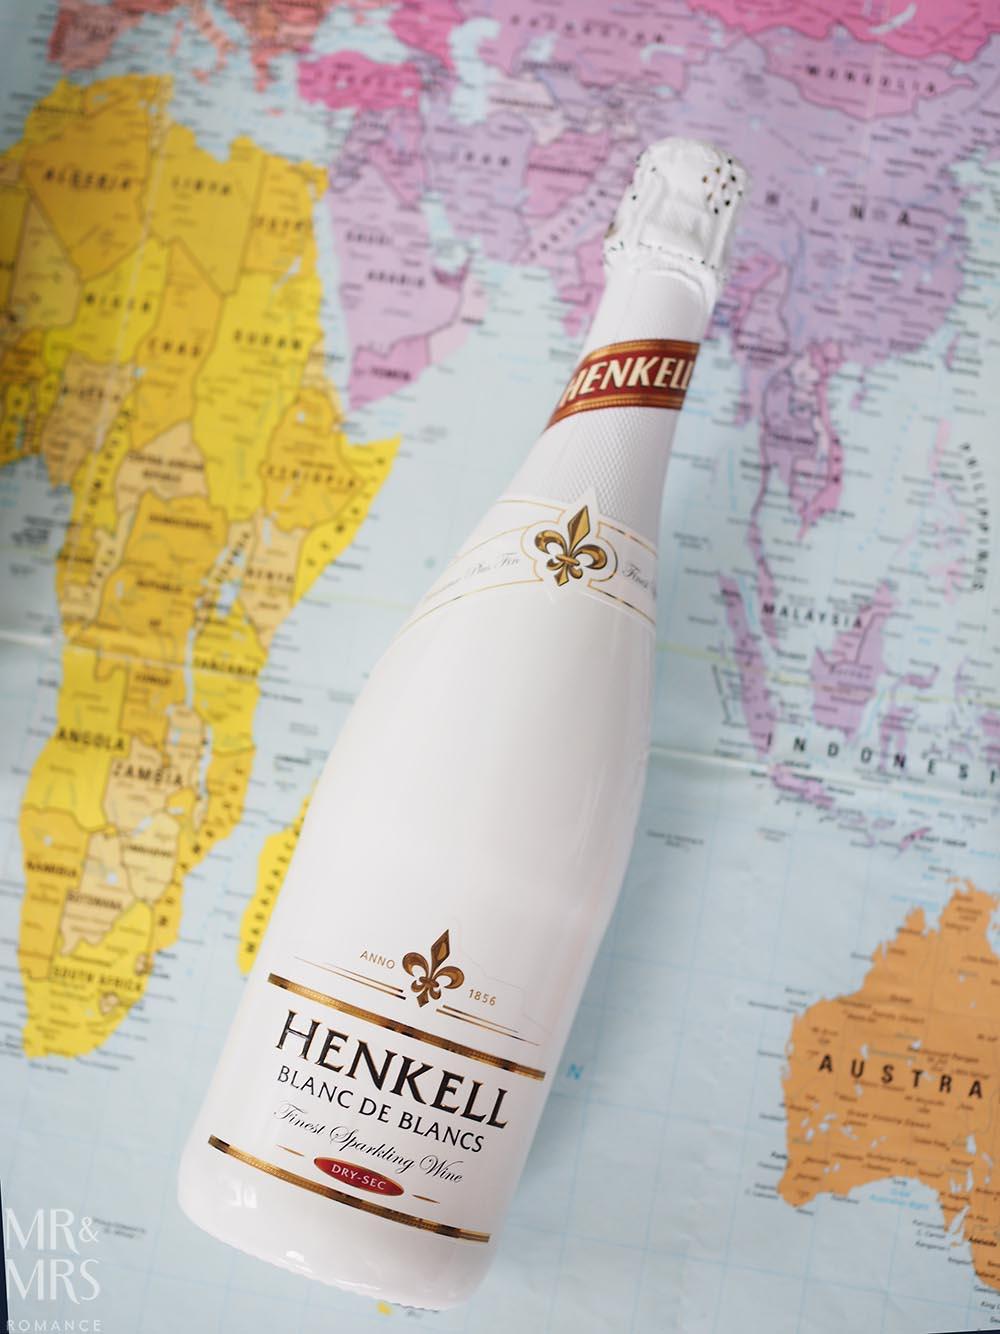 International sparkling wine - Henkell - Mr and Mrs Romance